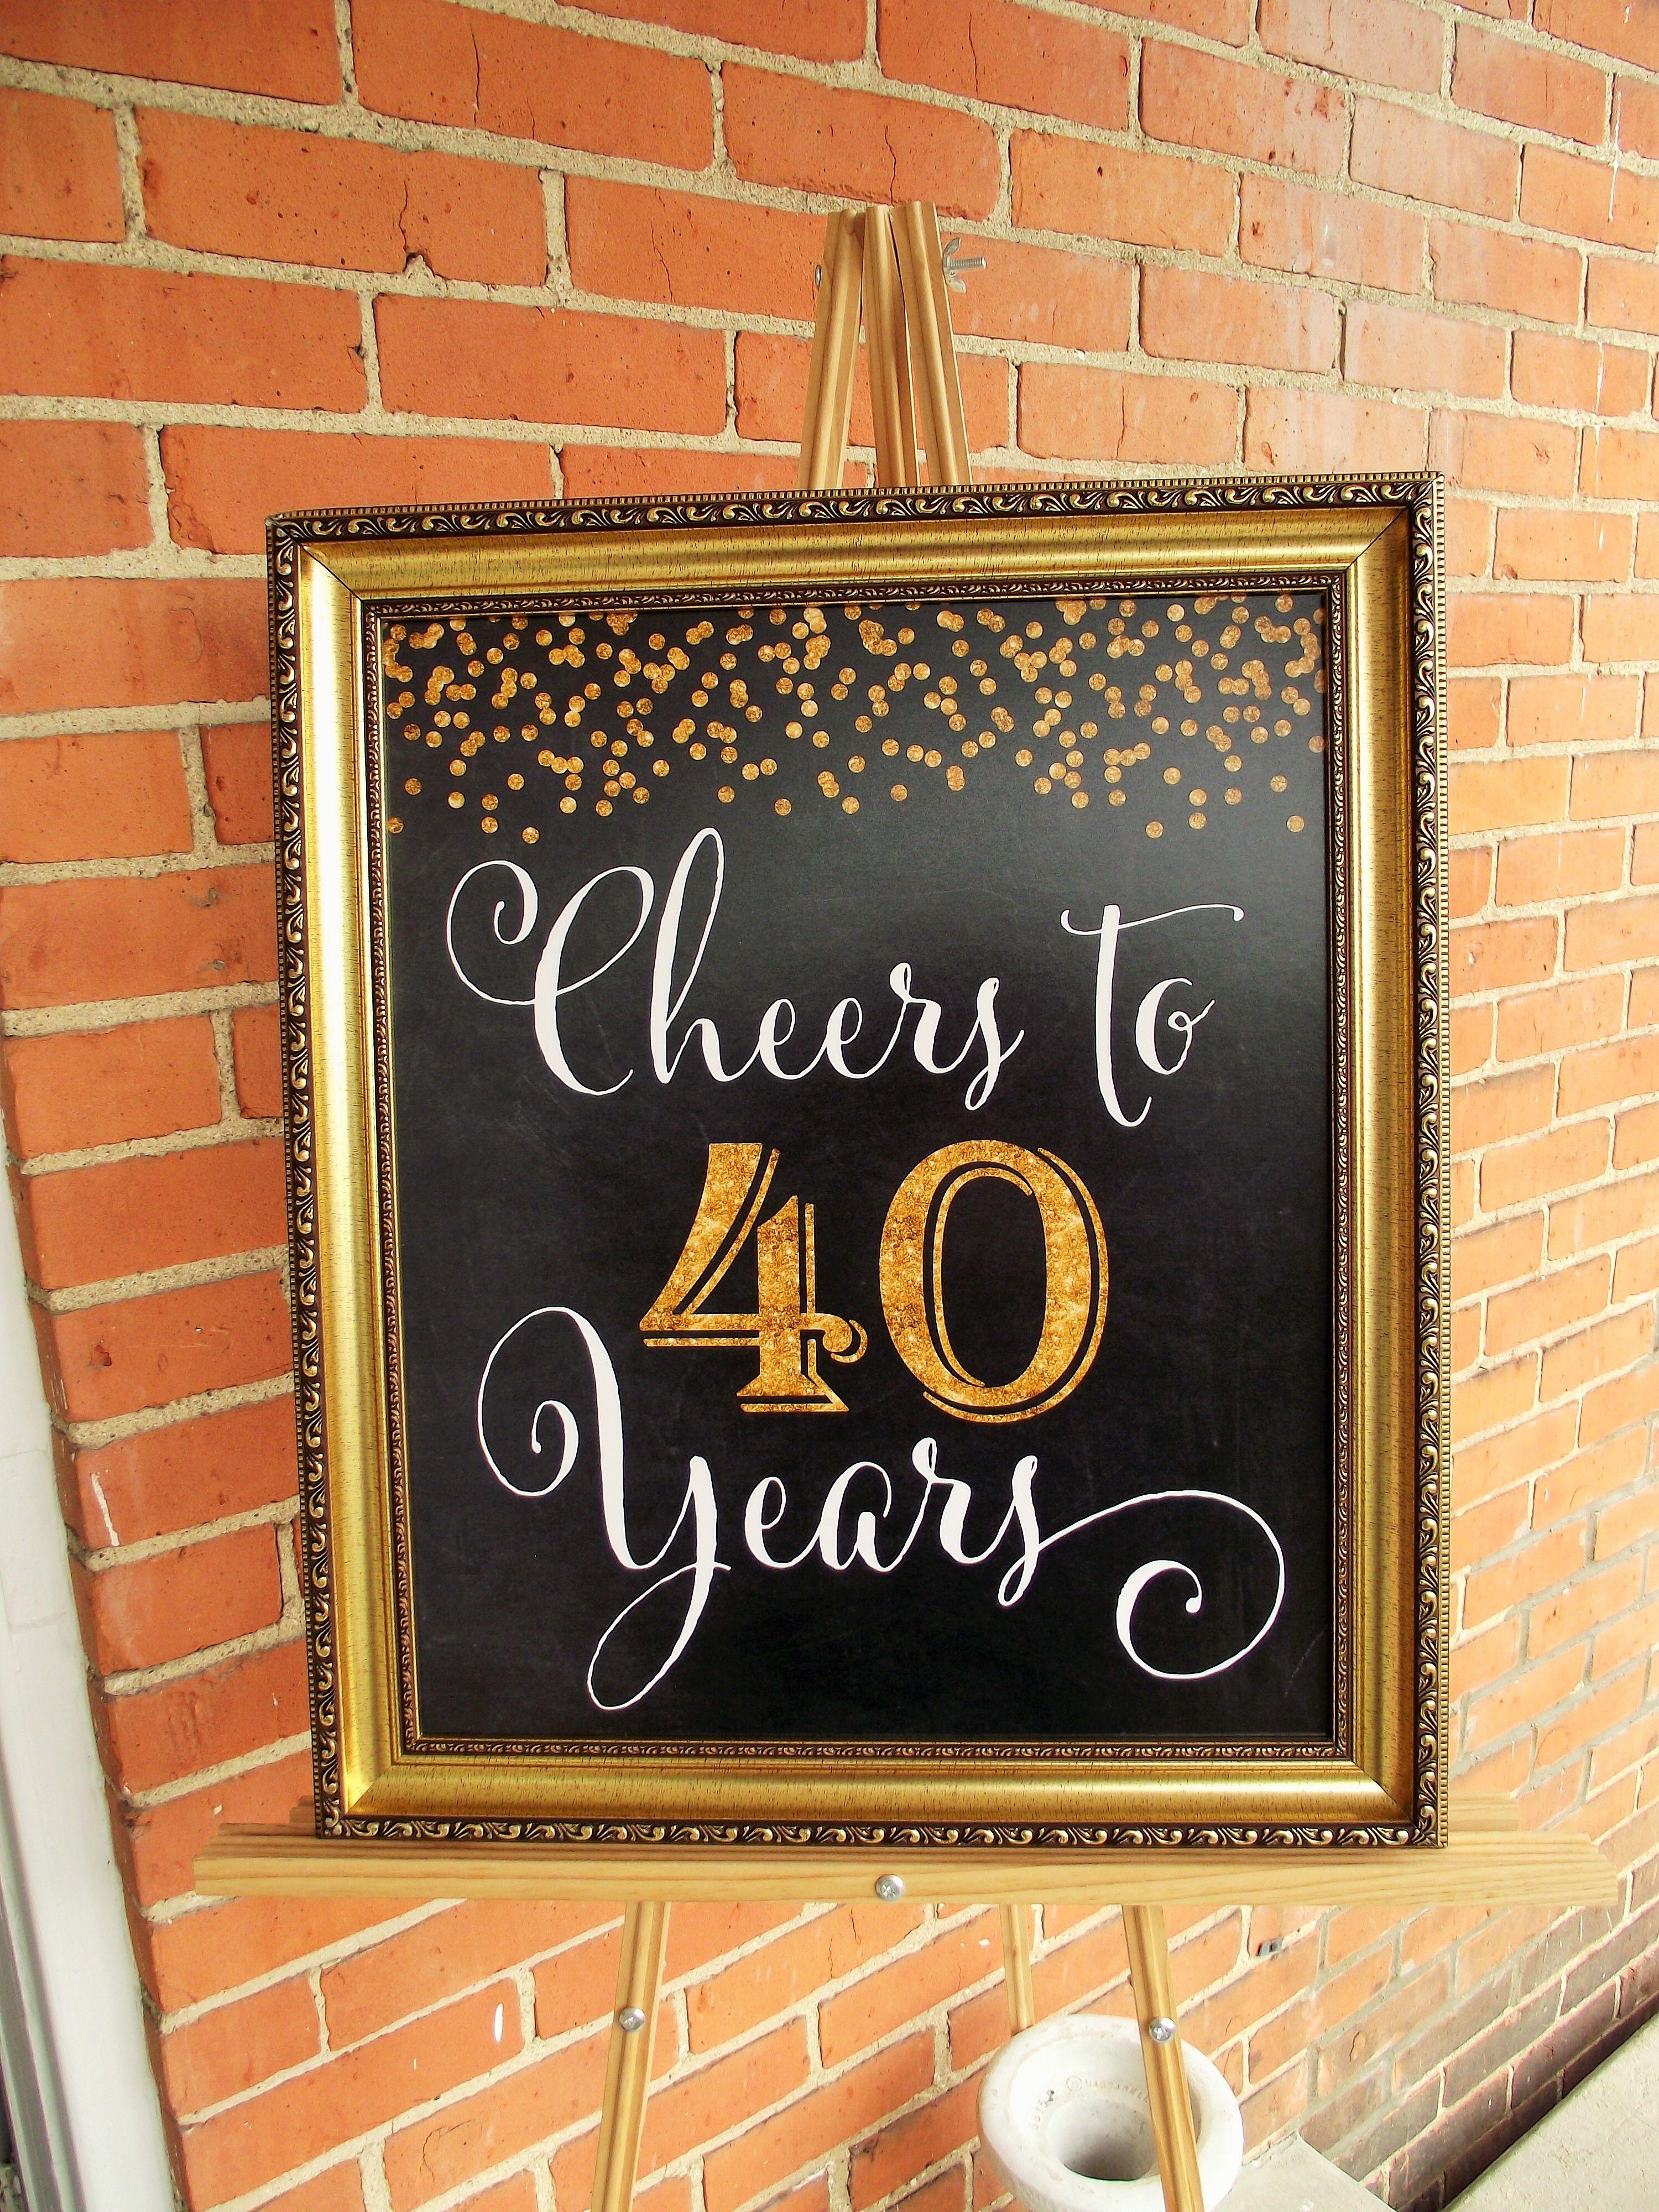 Decoration ideas for 40th wedding anniversary  th wedding anniversary party Cheers to  years  Life Styled